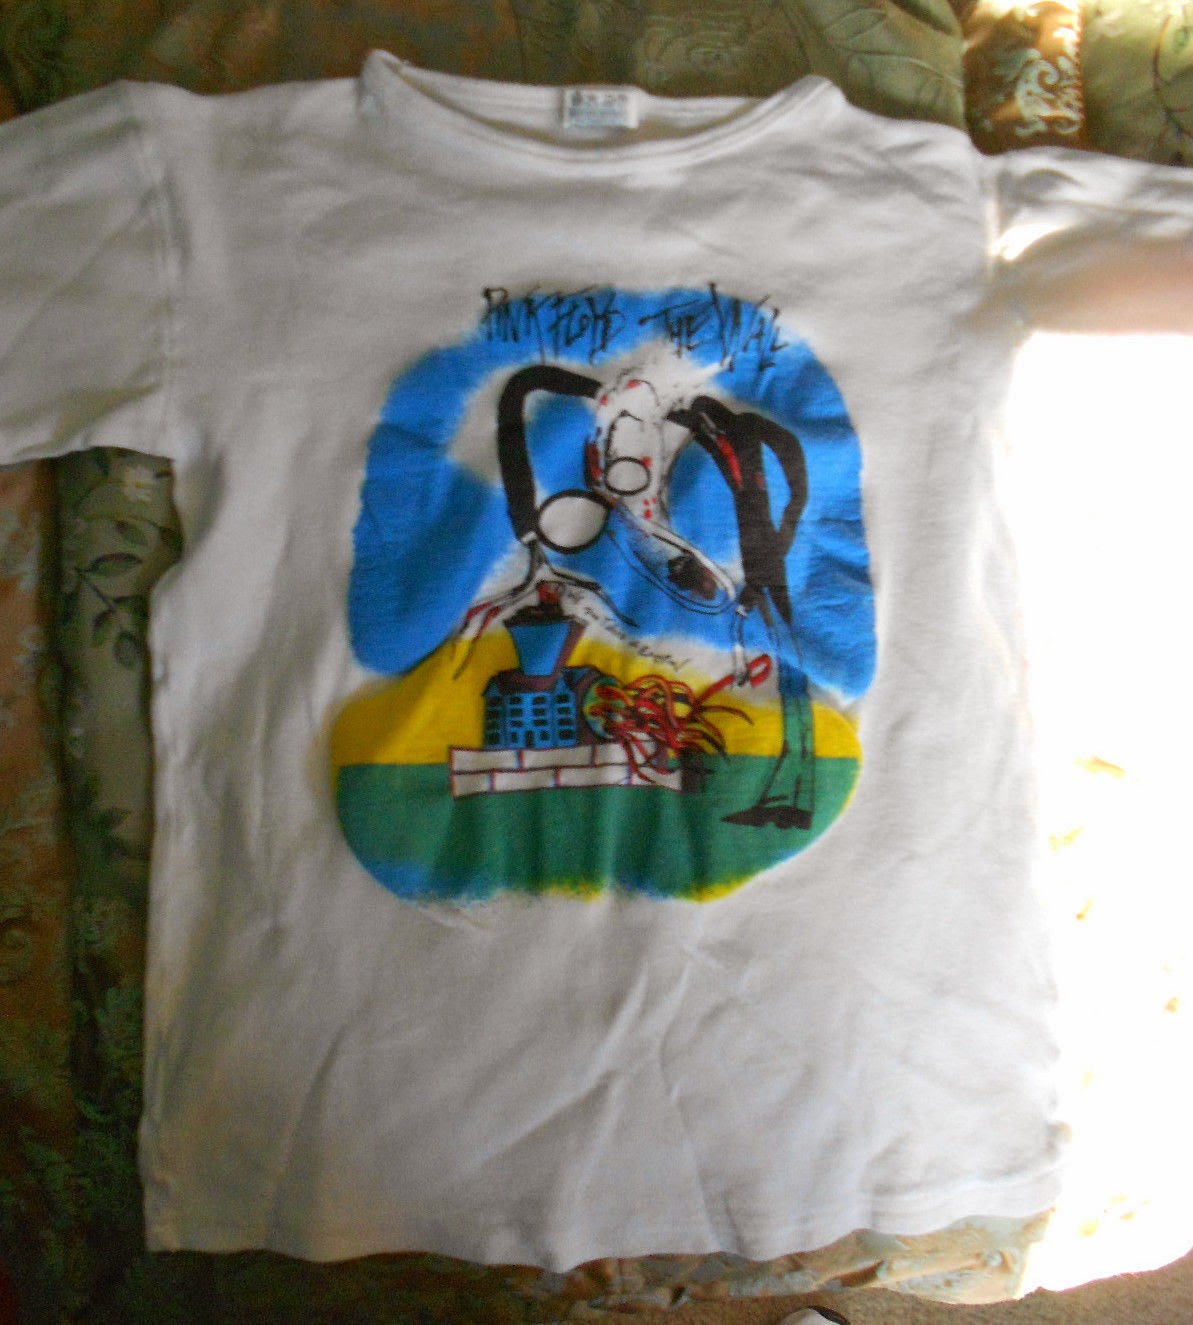 bc10899f PINK FLOYD THE WALL '82 TOUR ORIGINAL VINTAGE 1982 T-SHIRT | vintage ...